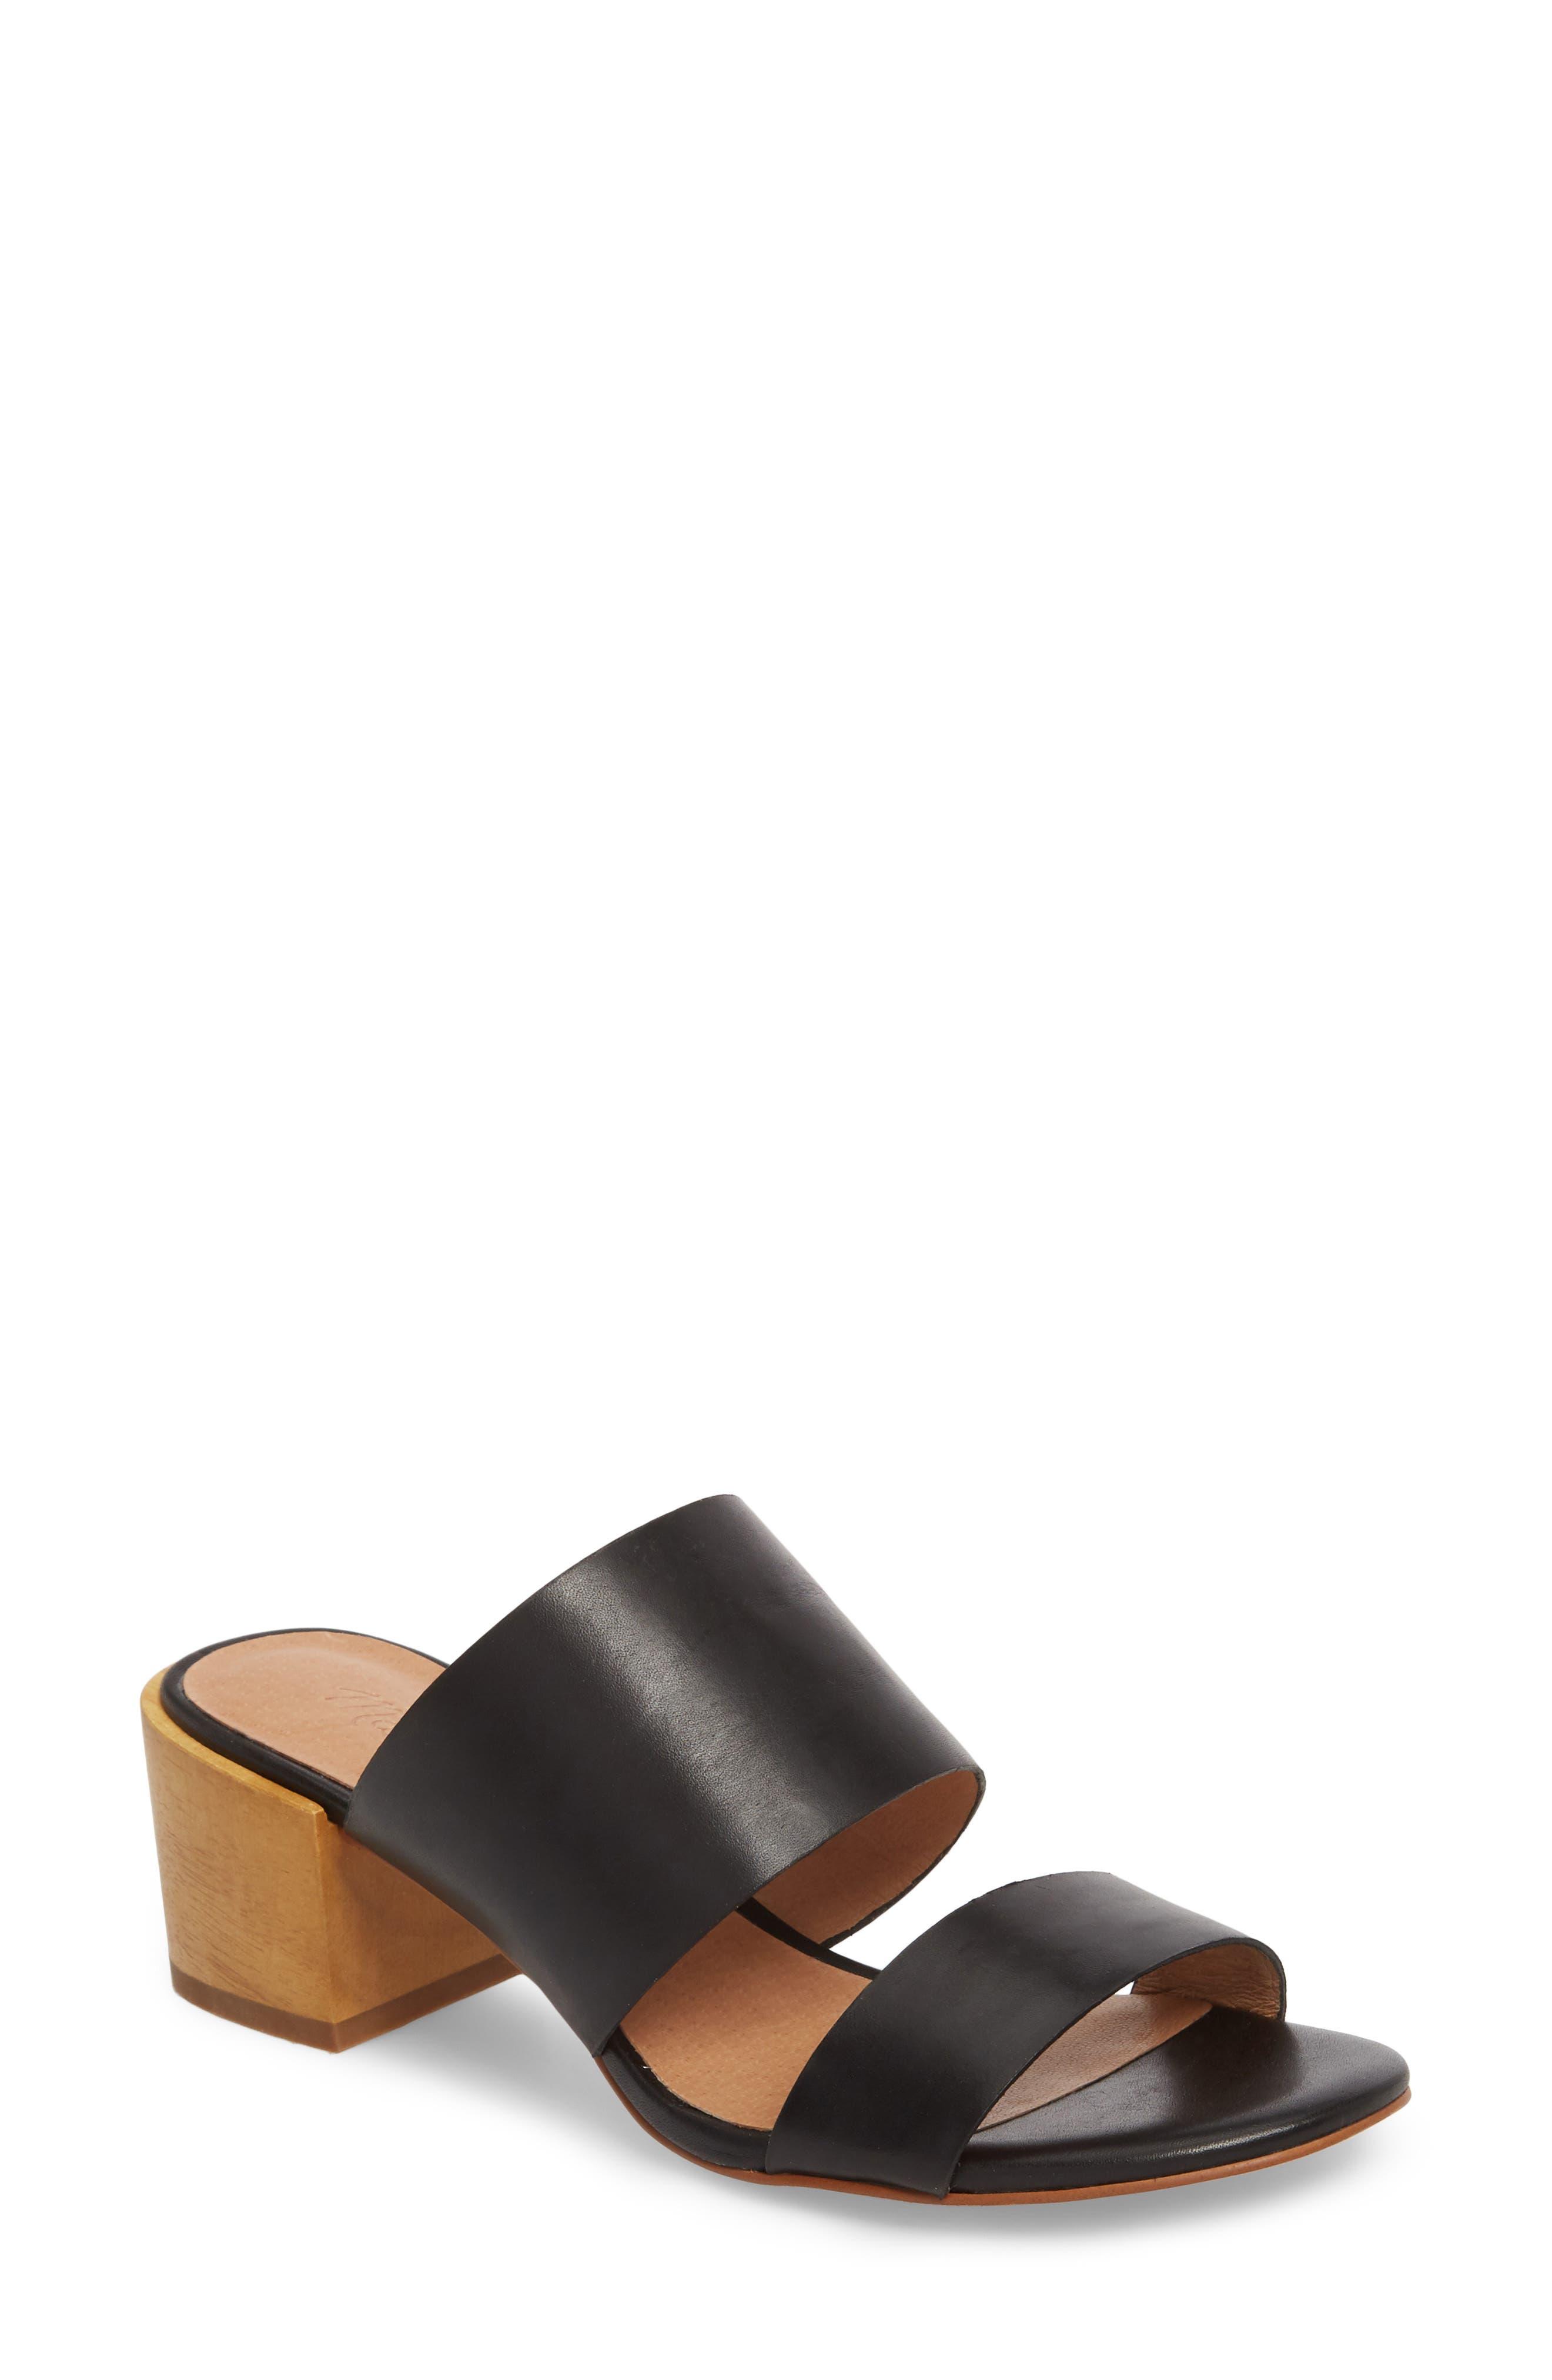 Kiera Block Heel Slide,                         Main,                         color,